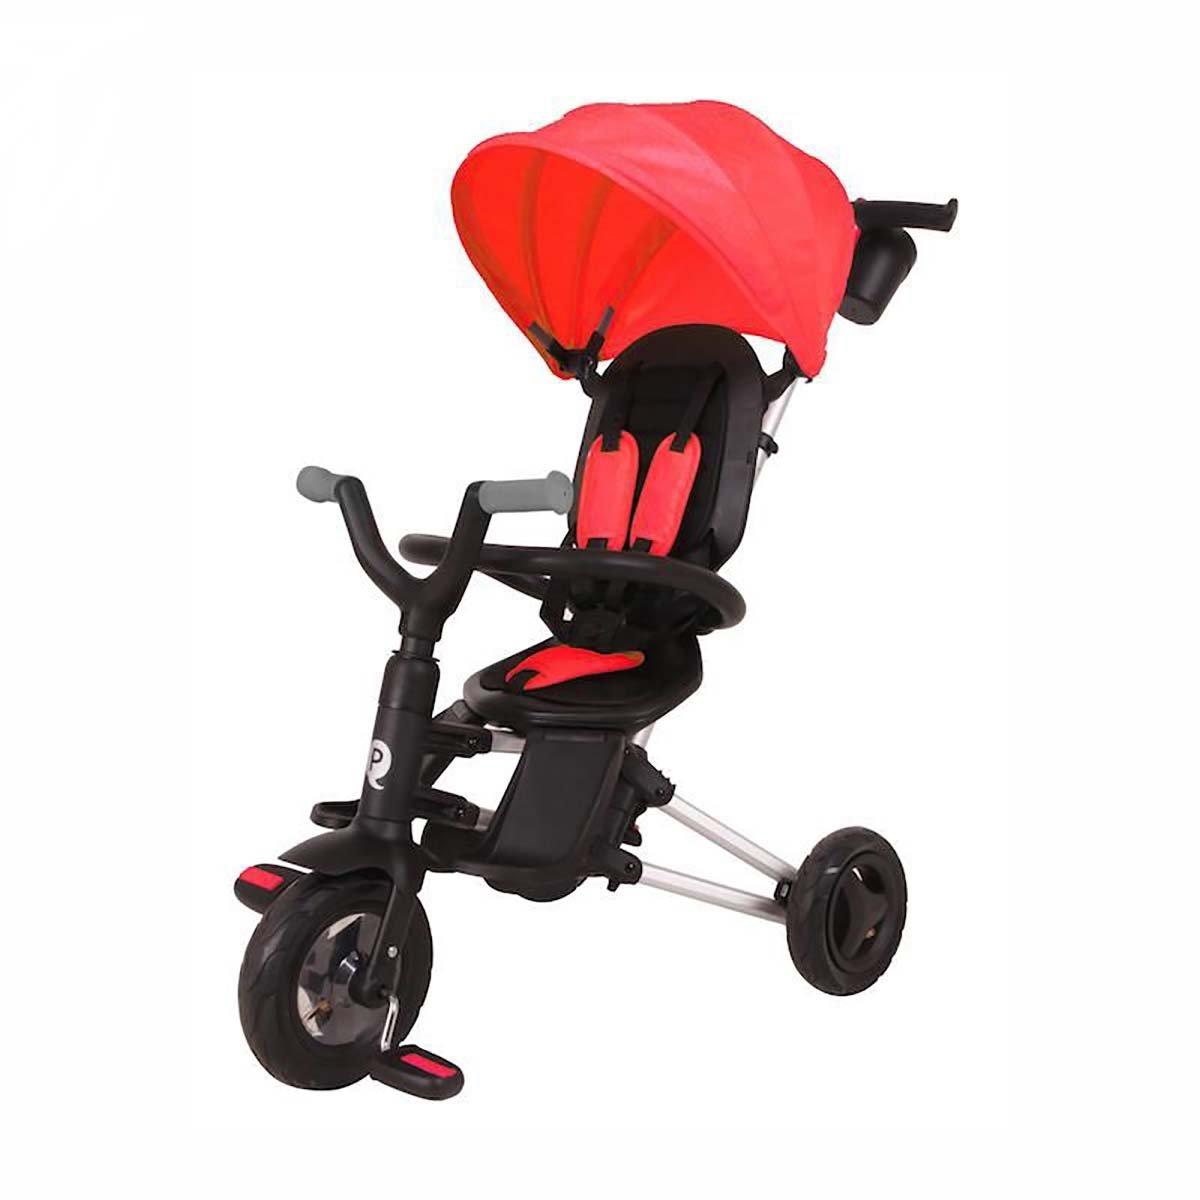 Tricicleta Ultrapliabila Qplay Nova Air, Rosu